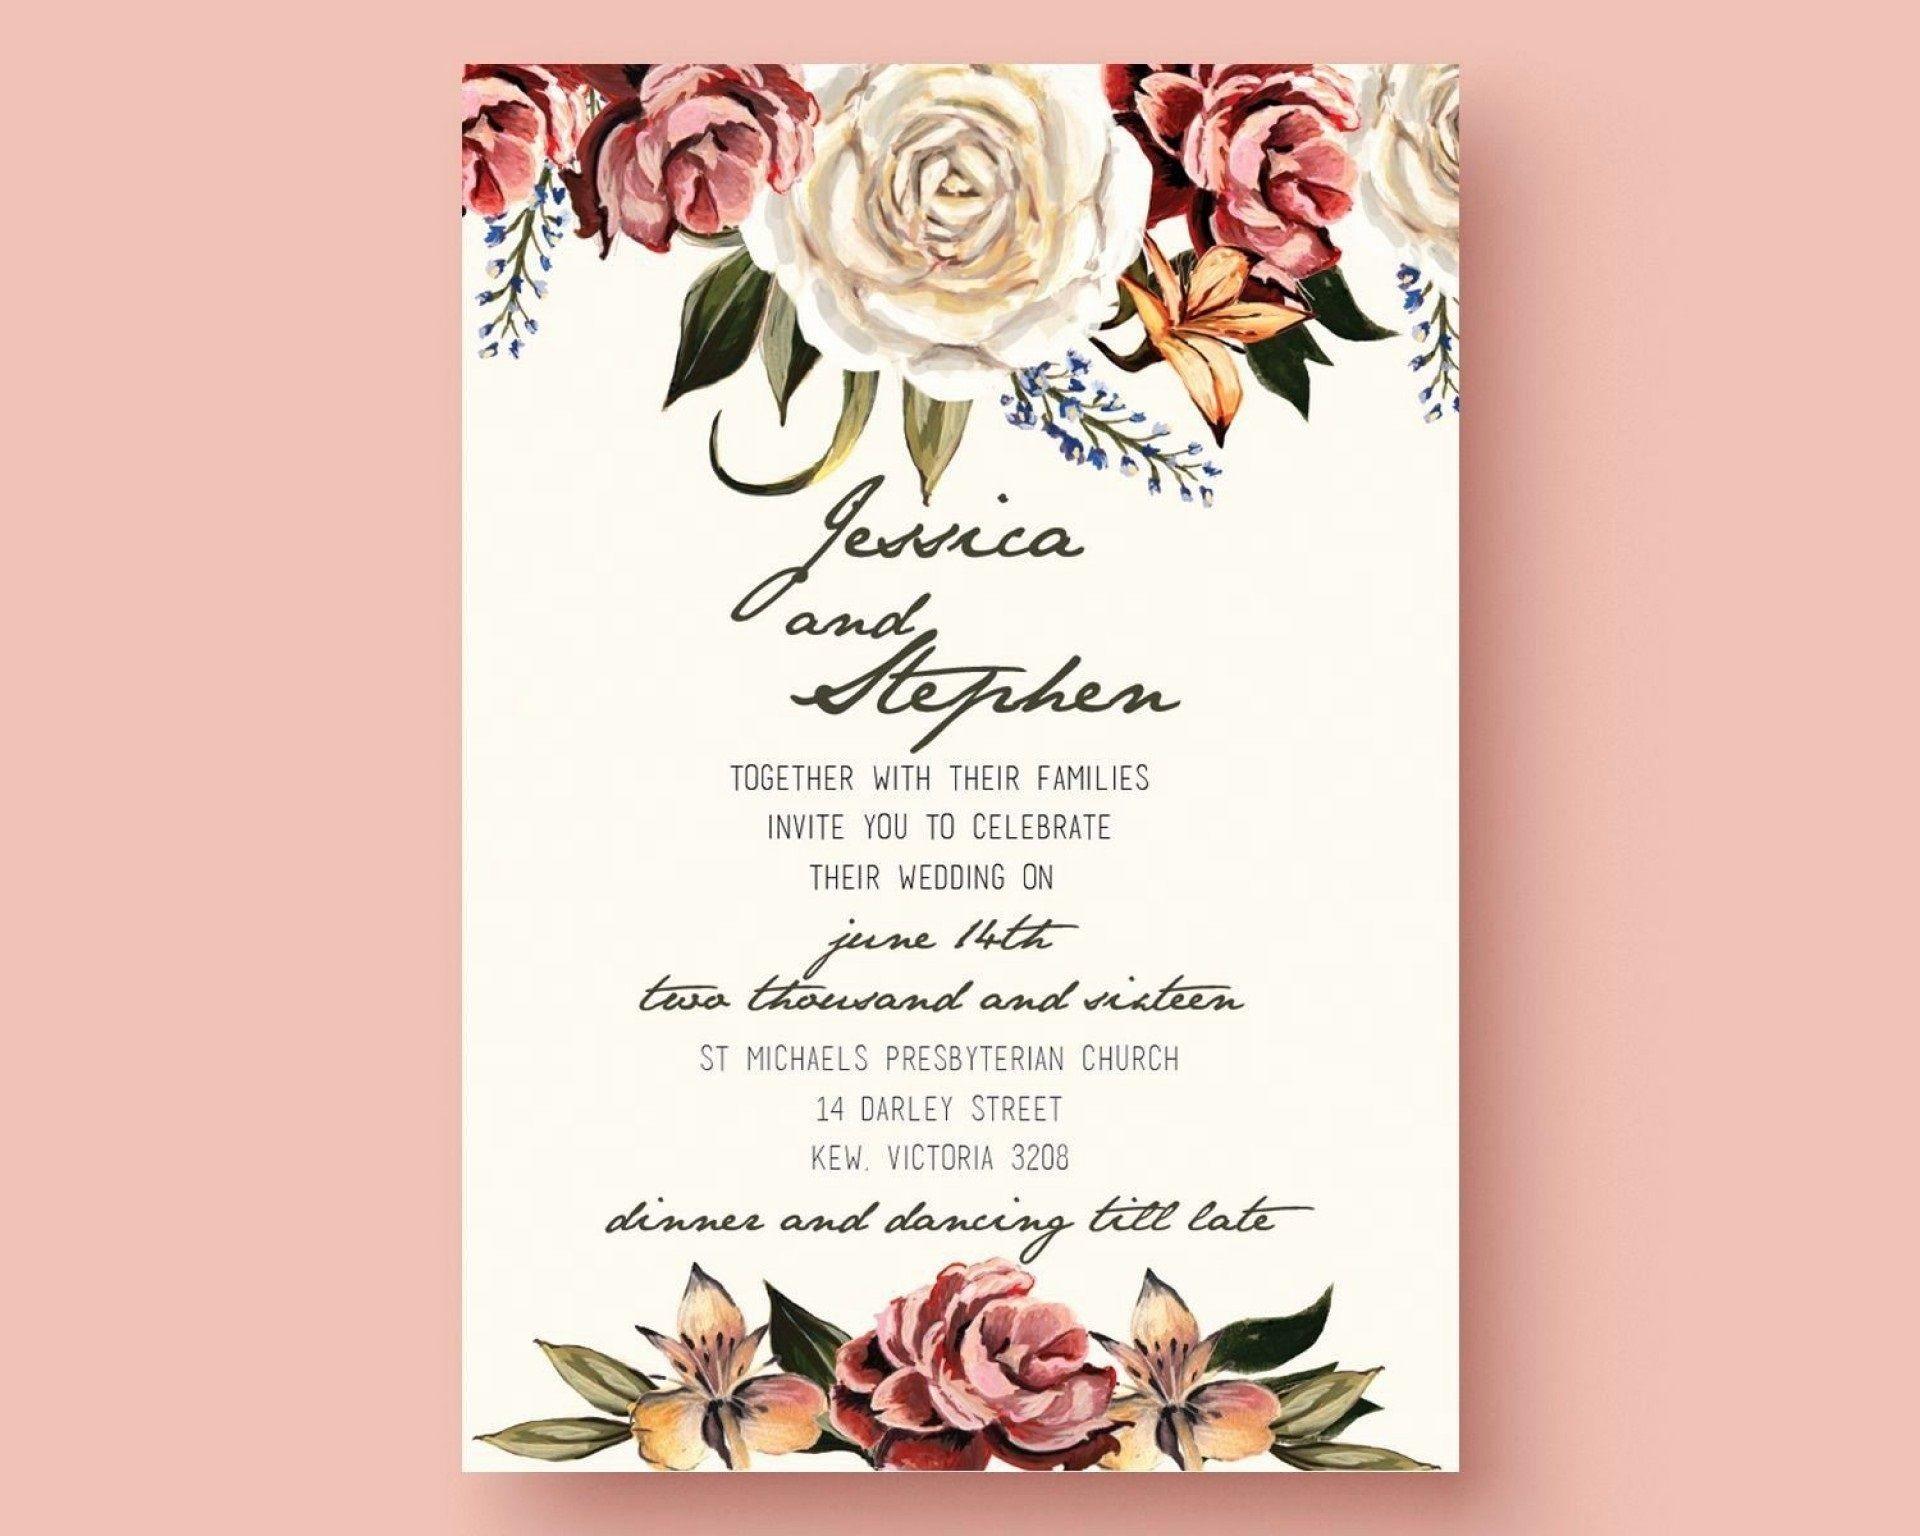 005 Dreaded Microsoft Word Wedding Invitation Template Free Download High Resolution  M Editable1920